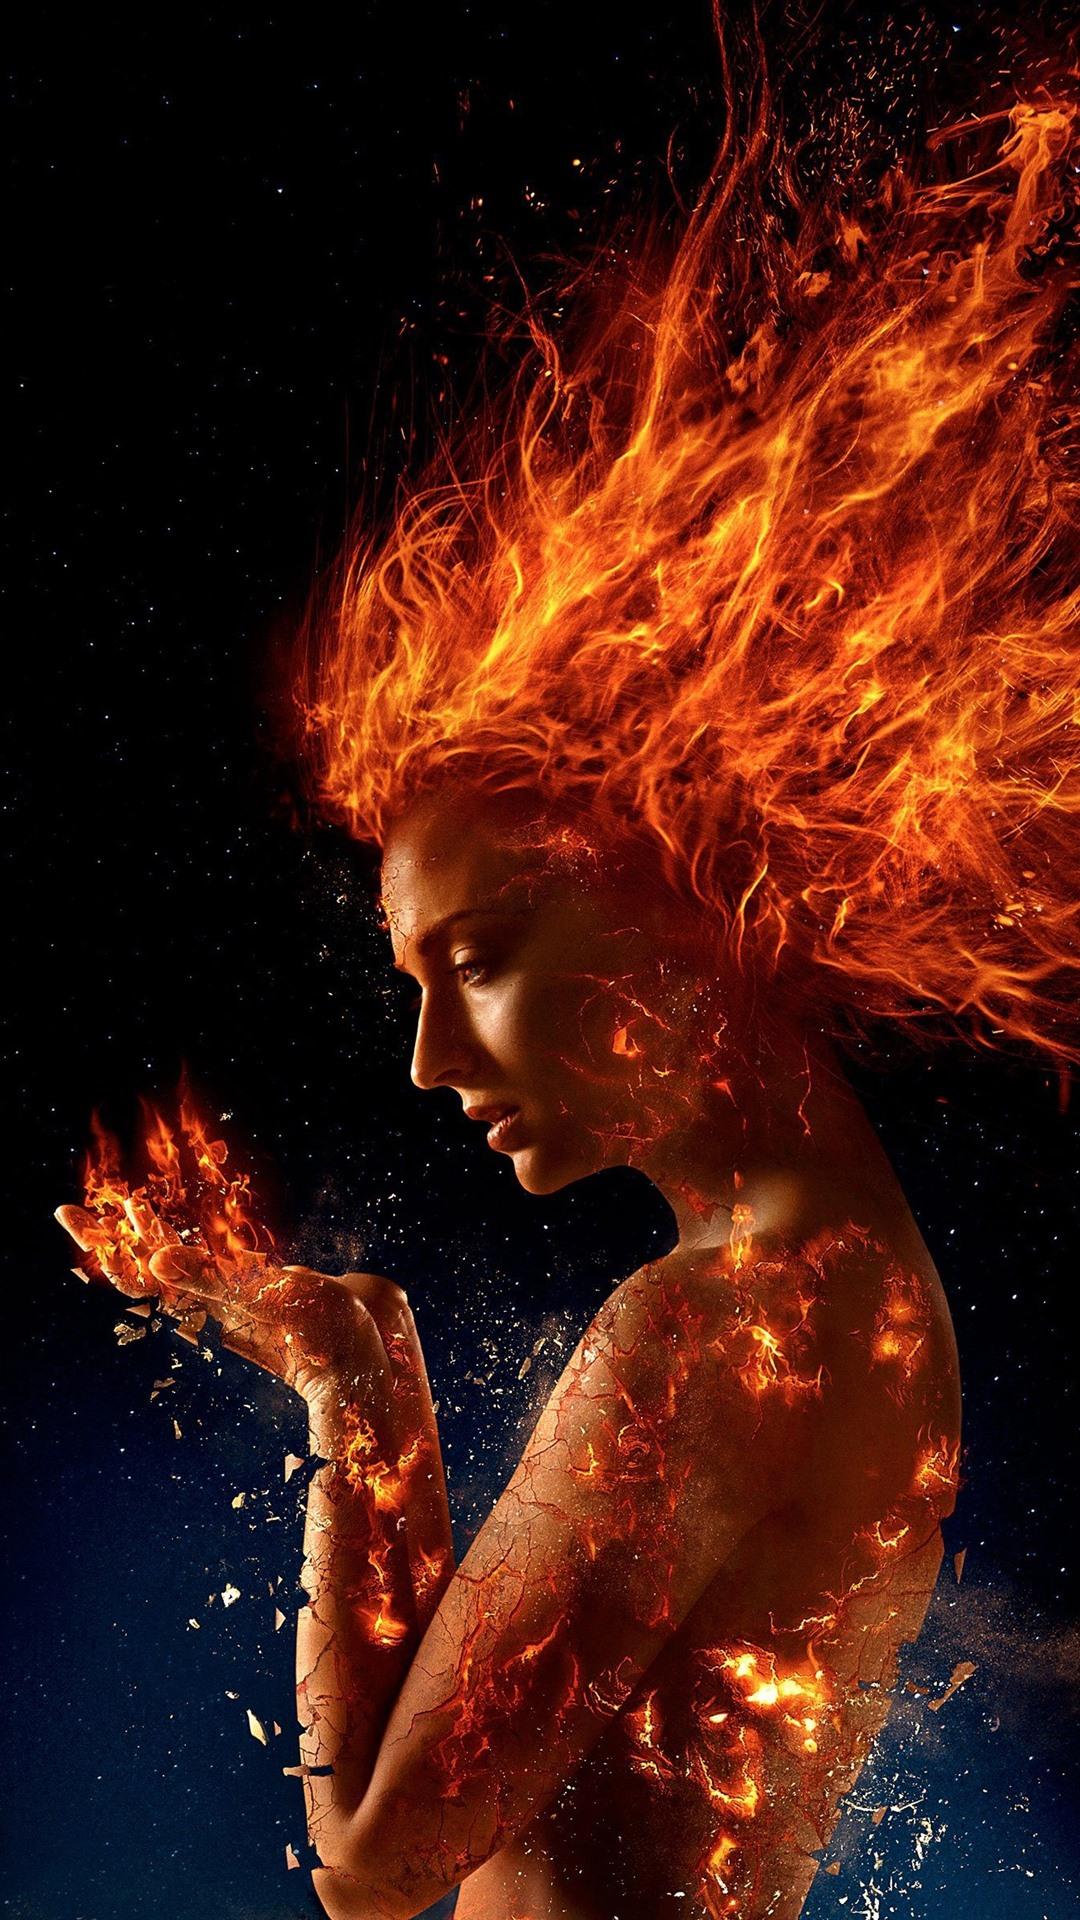 X Men Dark Phoenix Girl Fire 1080x1920 Iphone 8766s